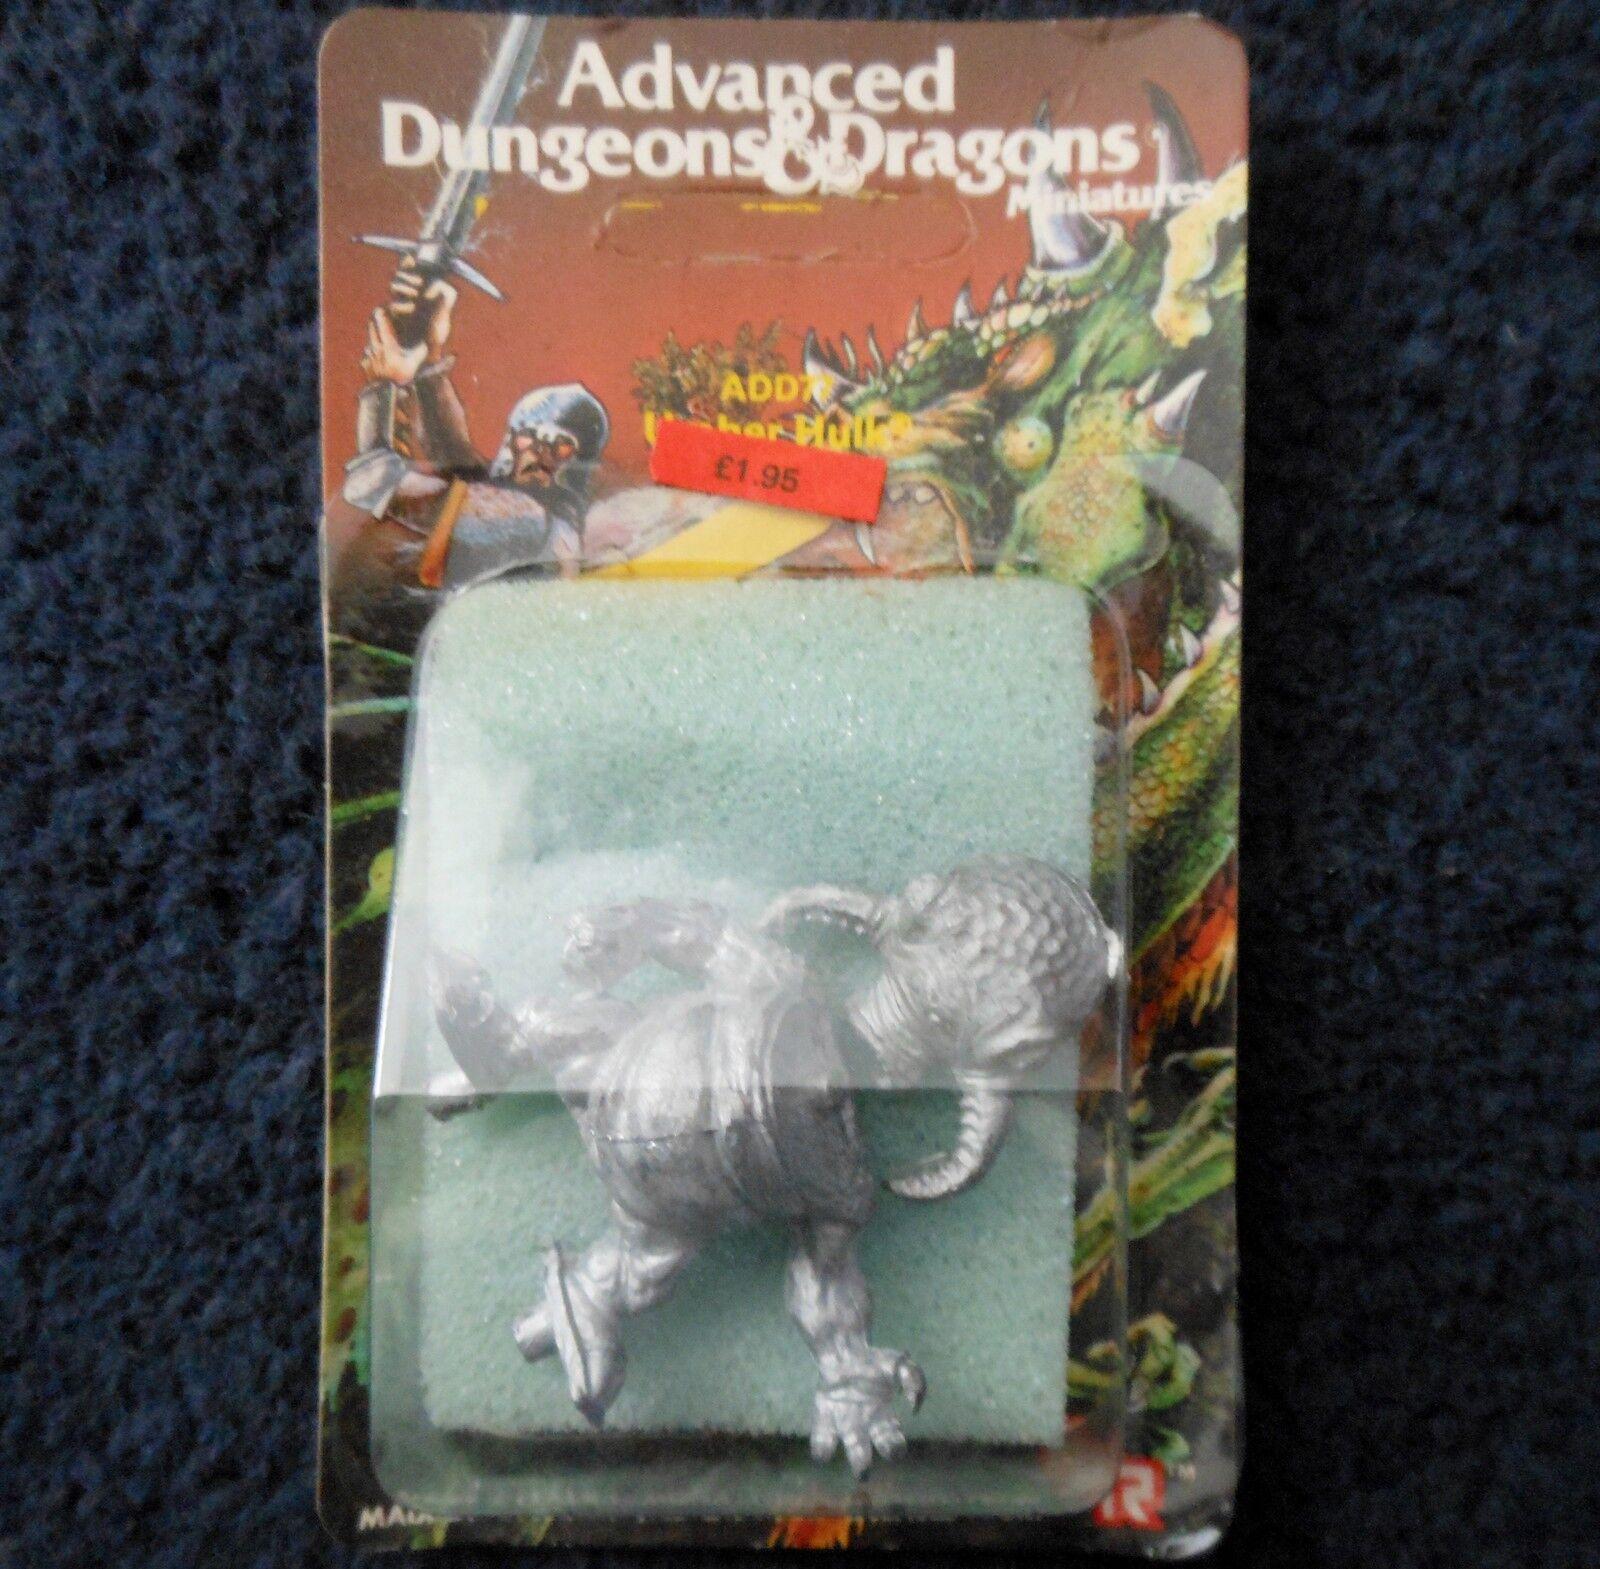 1985 add77 umber hulk v1 advanced dungeons & dragons games workshop ad & d tsr mib